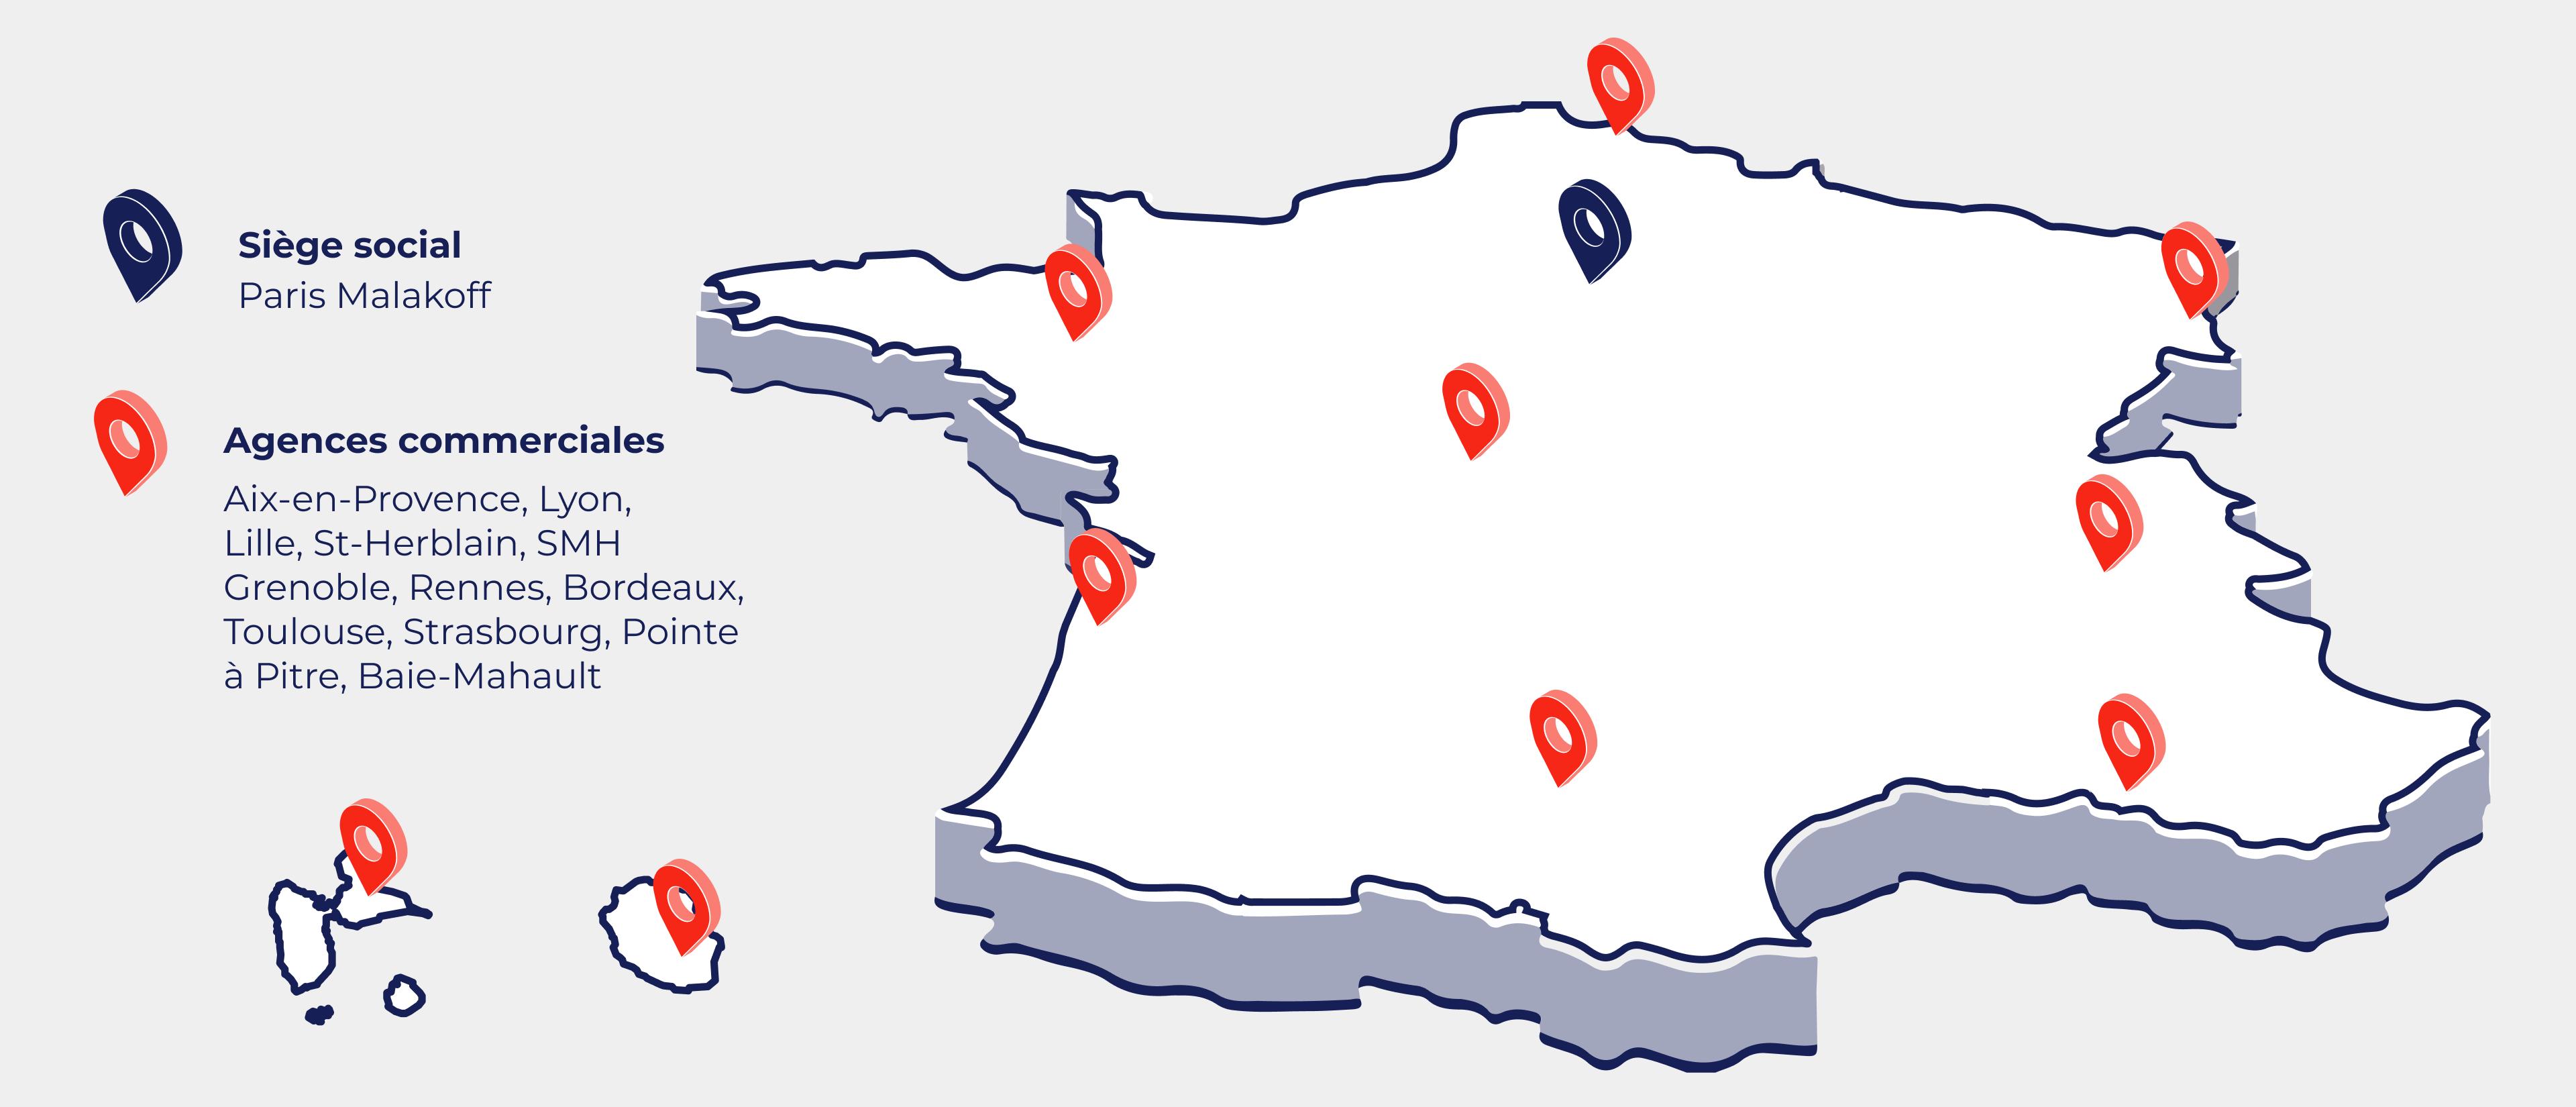 notre-presence-region-edenred-france